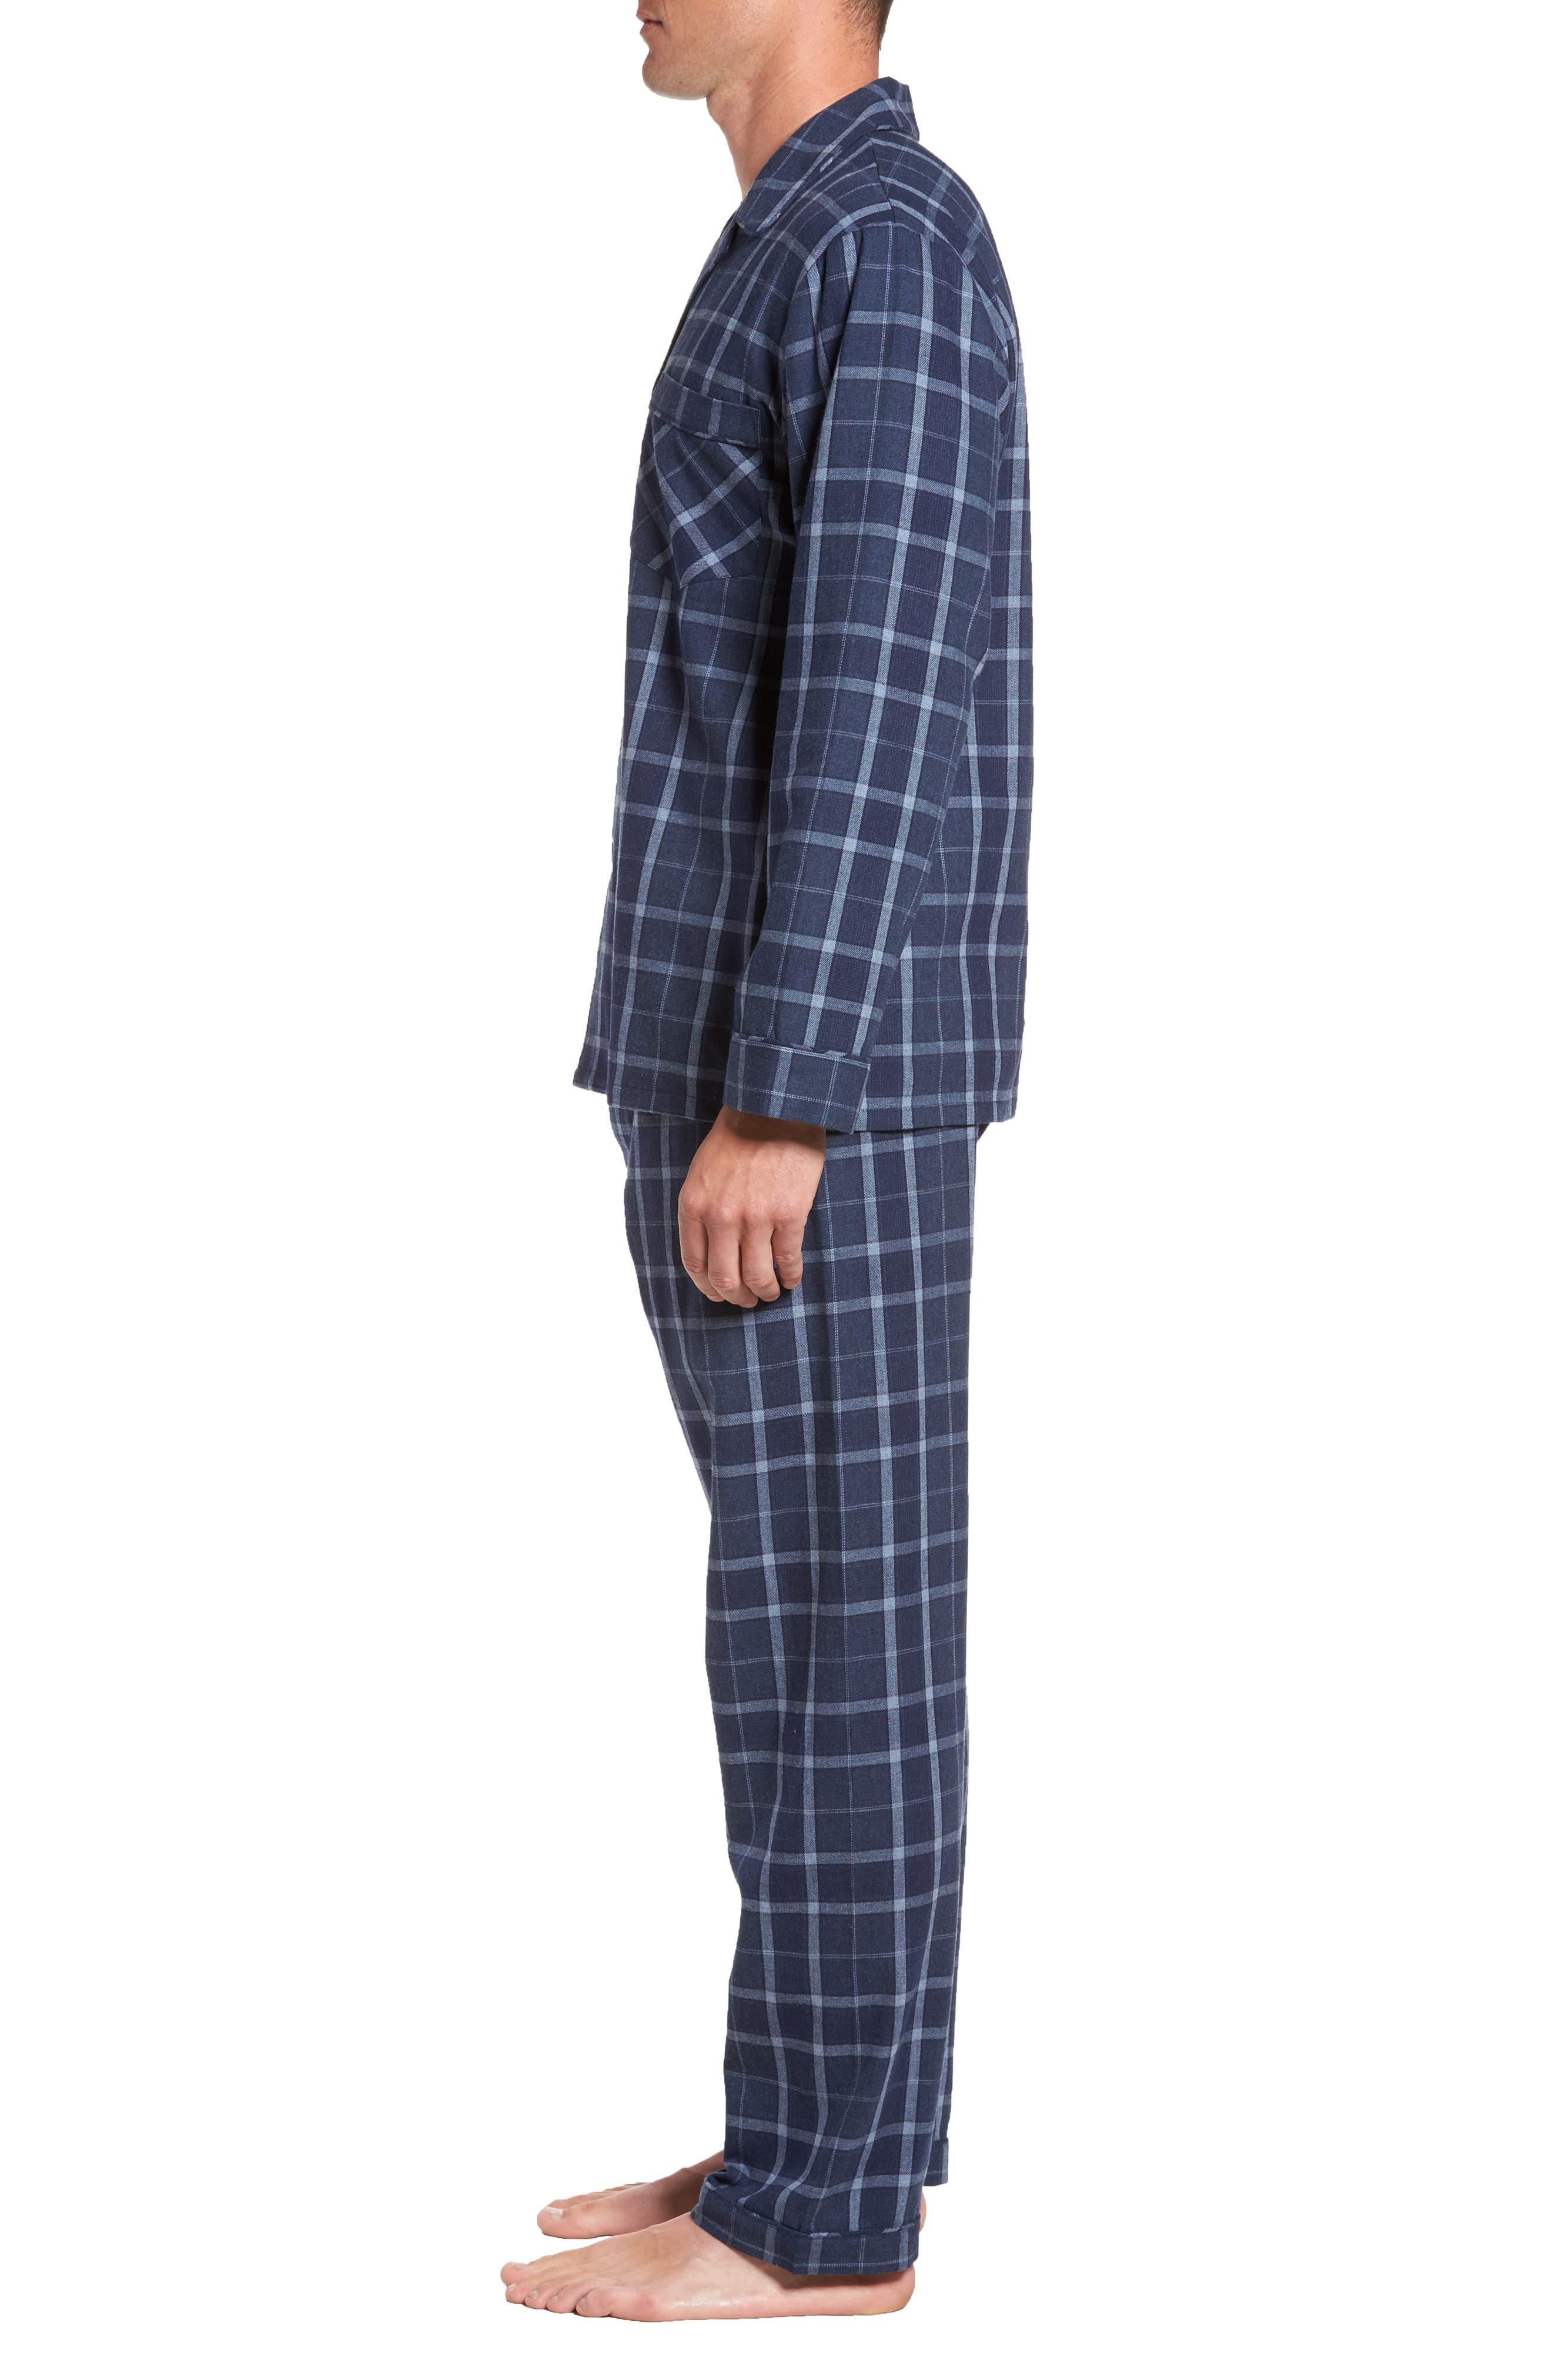 Guiness Plaid Pajama Set,                             Alternate thumbnail 3, color,                             Navy